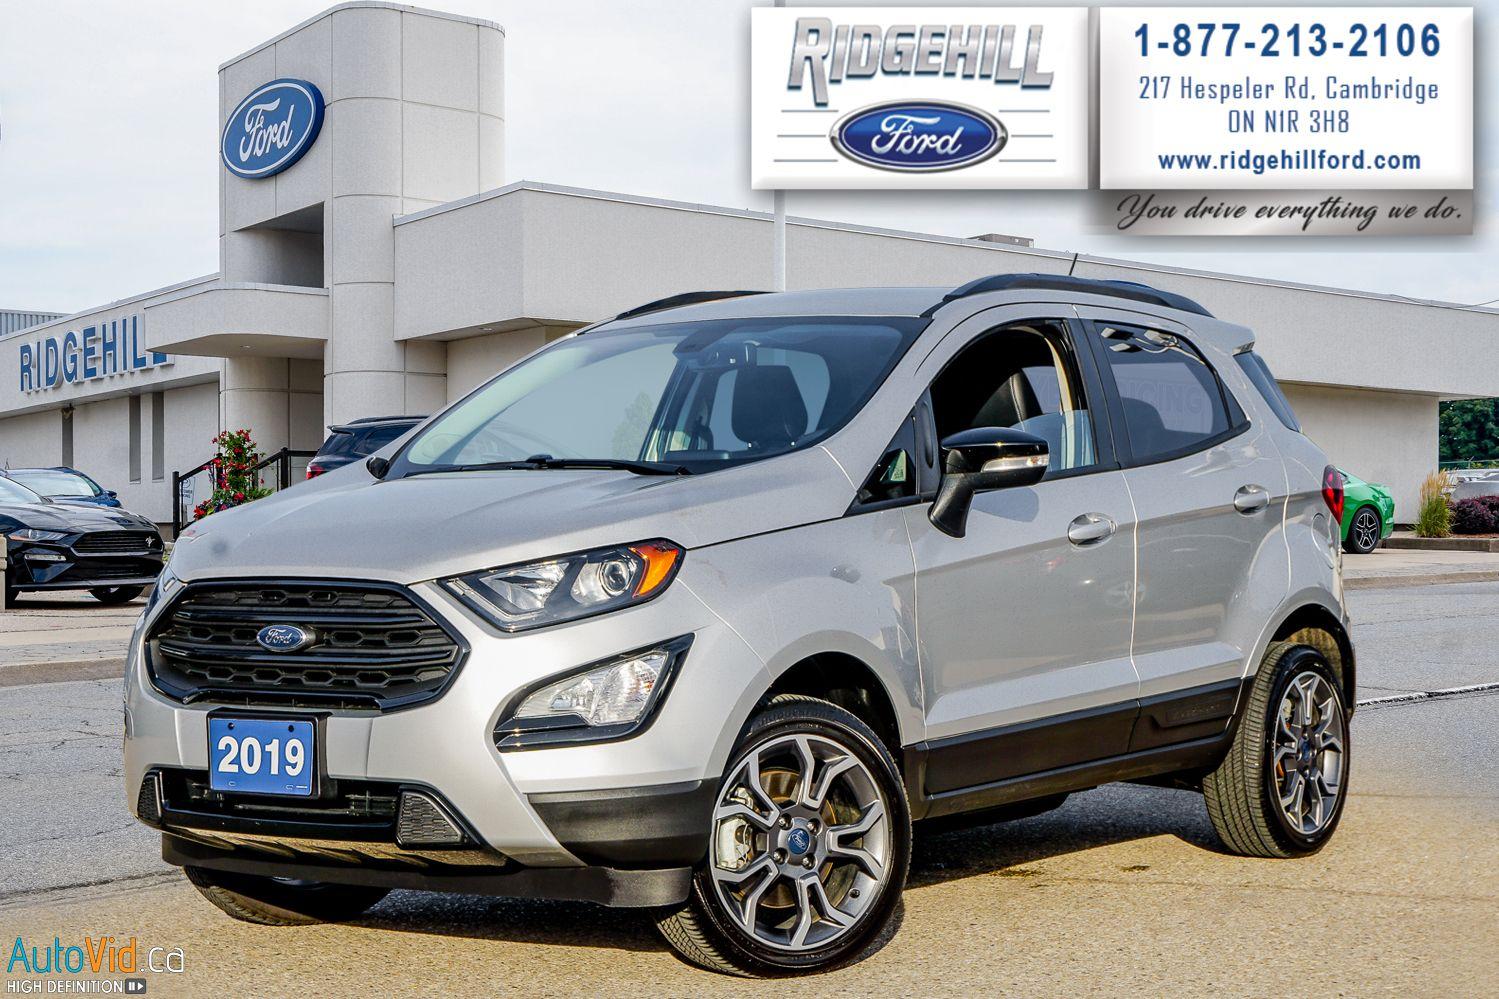 2019 Ford EcoSport Image